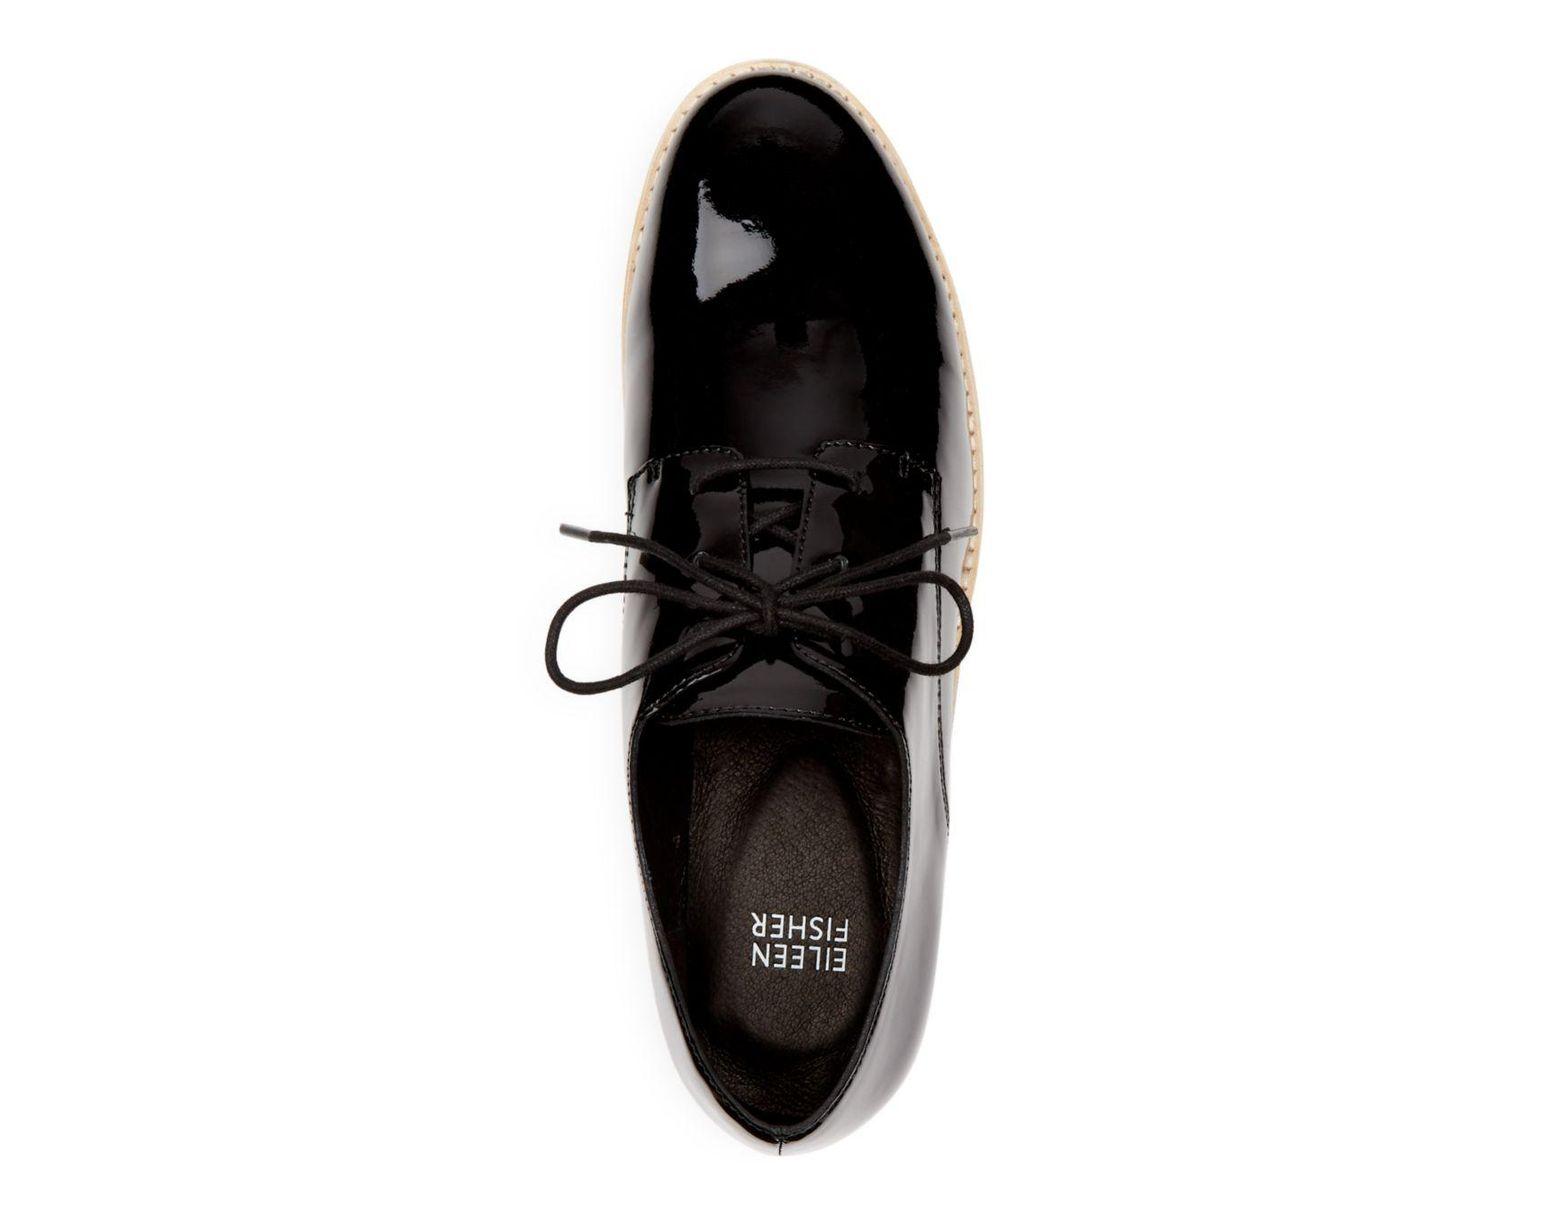 73e420b89d6 Black Women's Eddy Patent Leather Plain Toe Platform Loafers